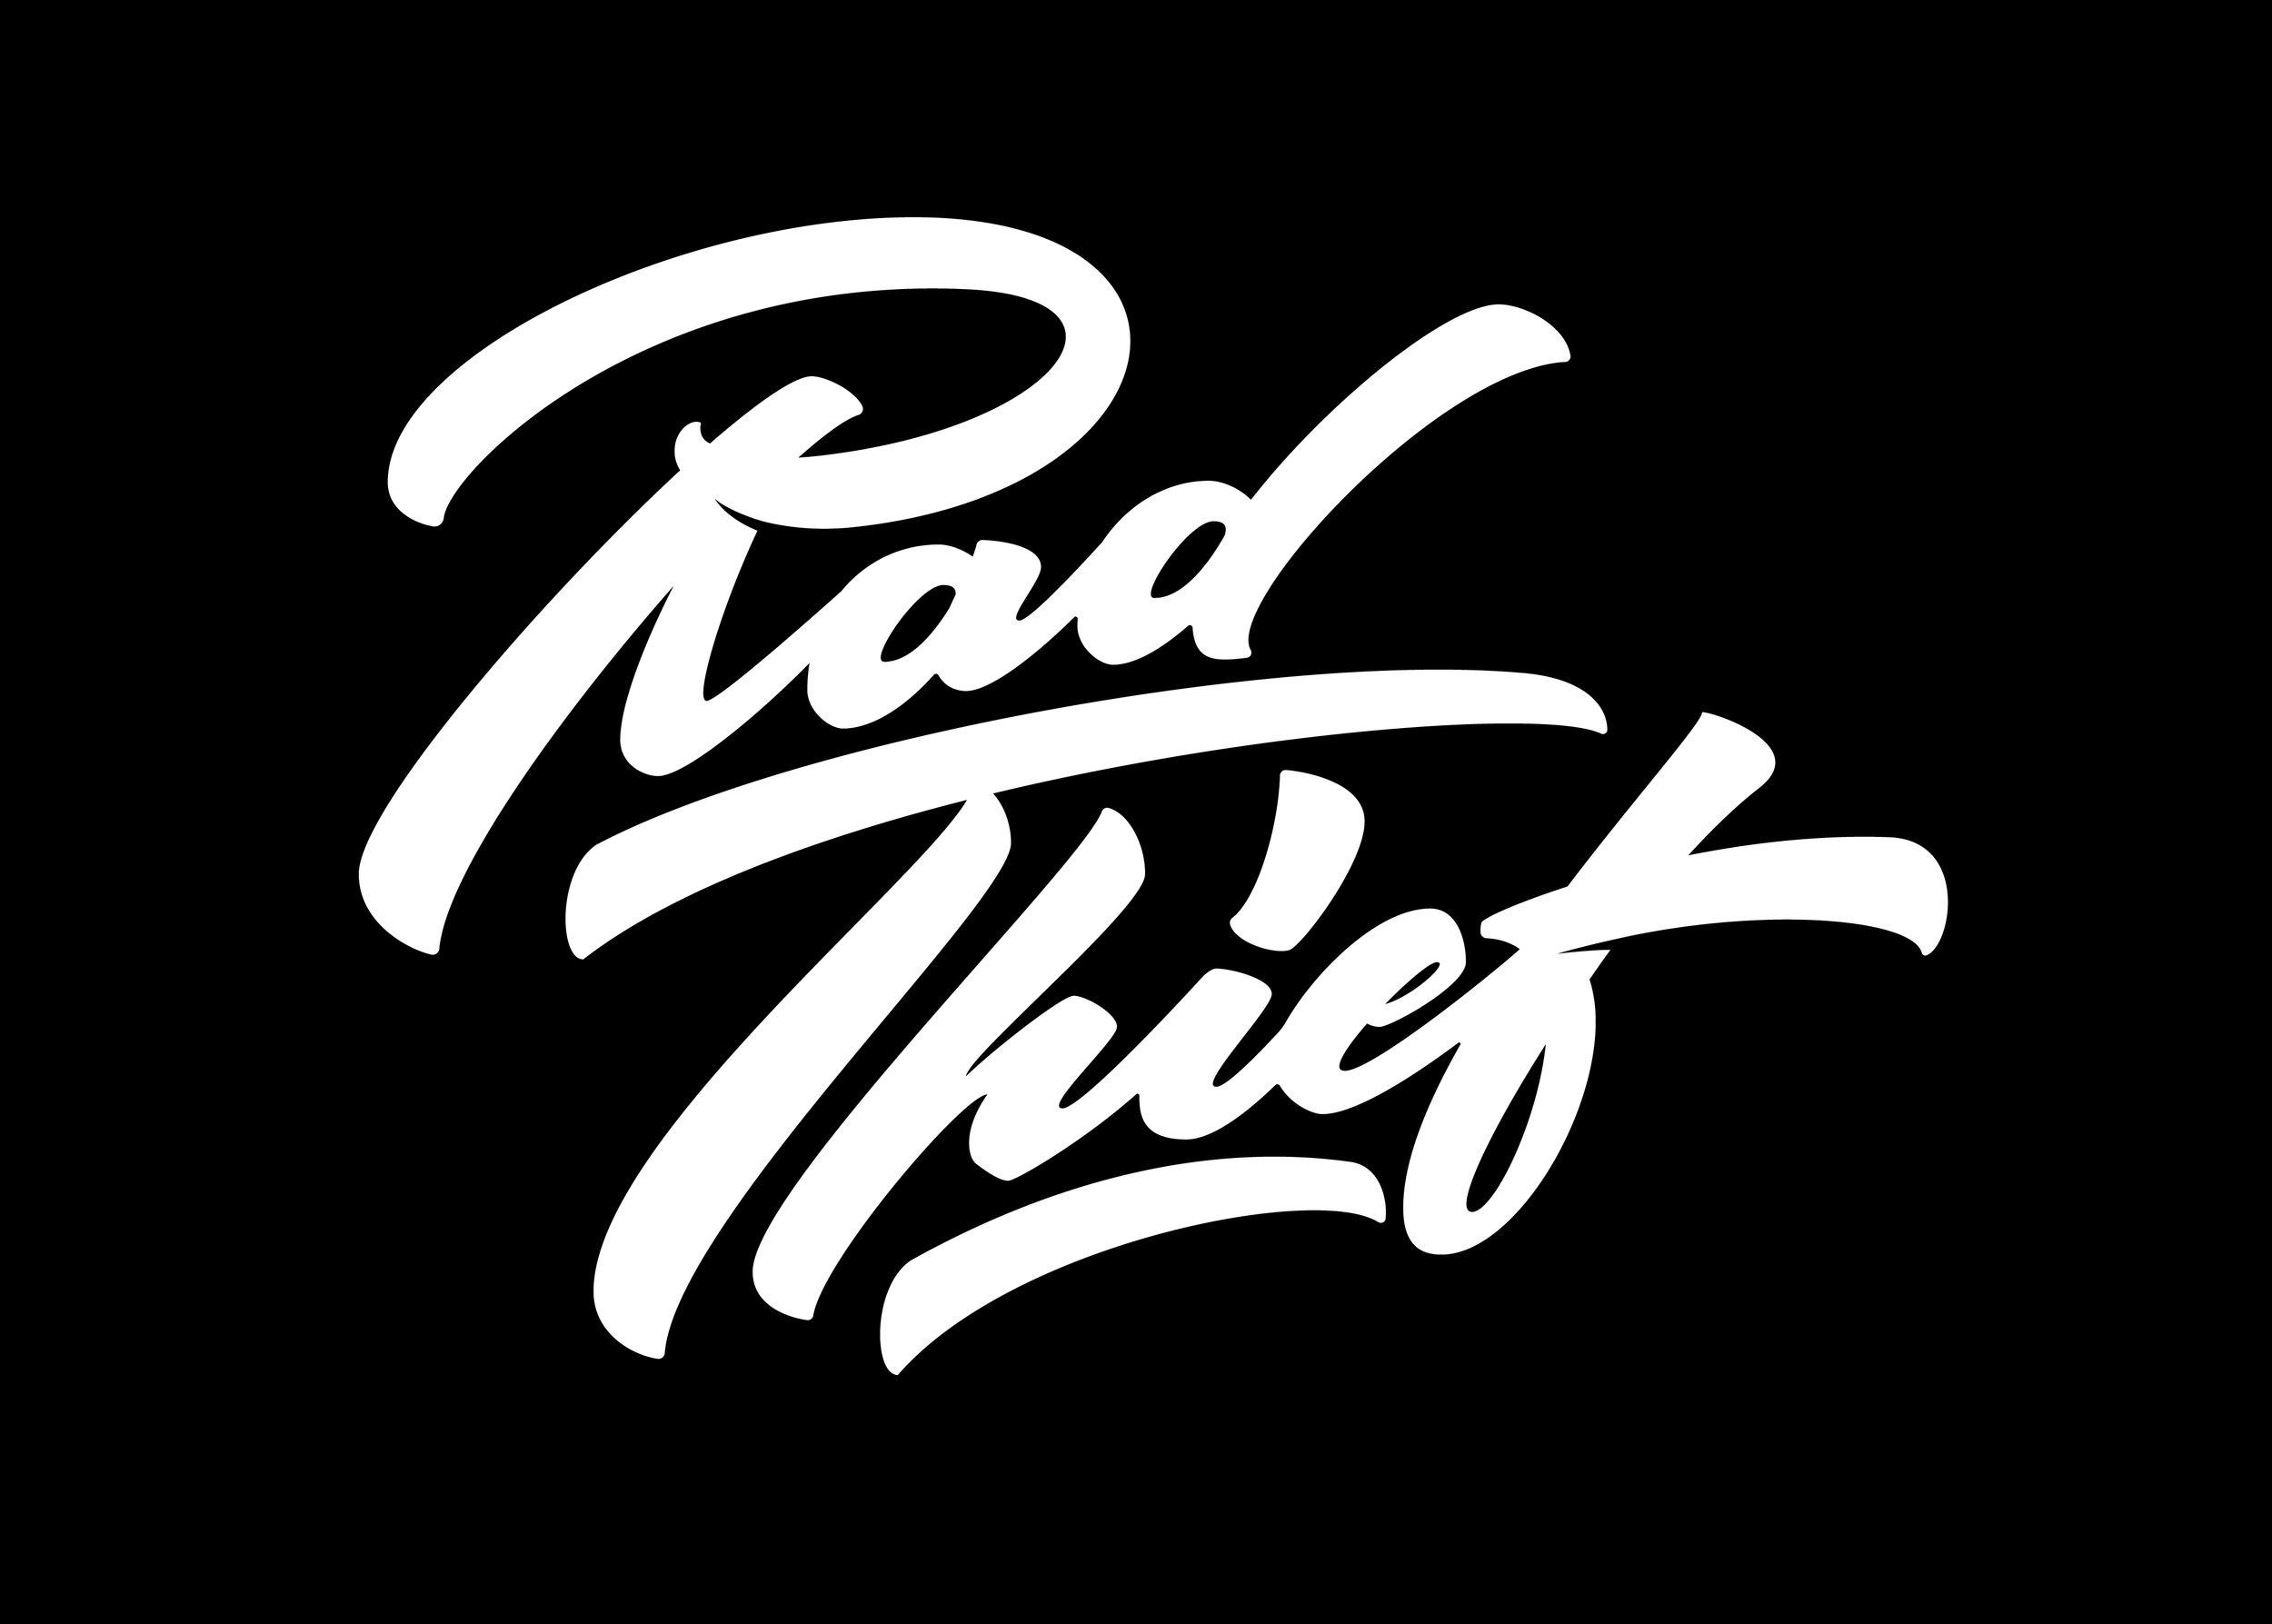 Rad Thief